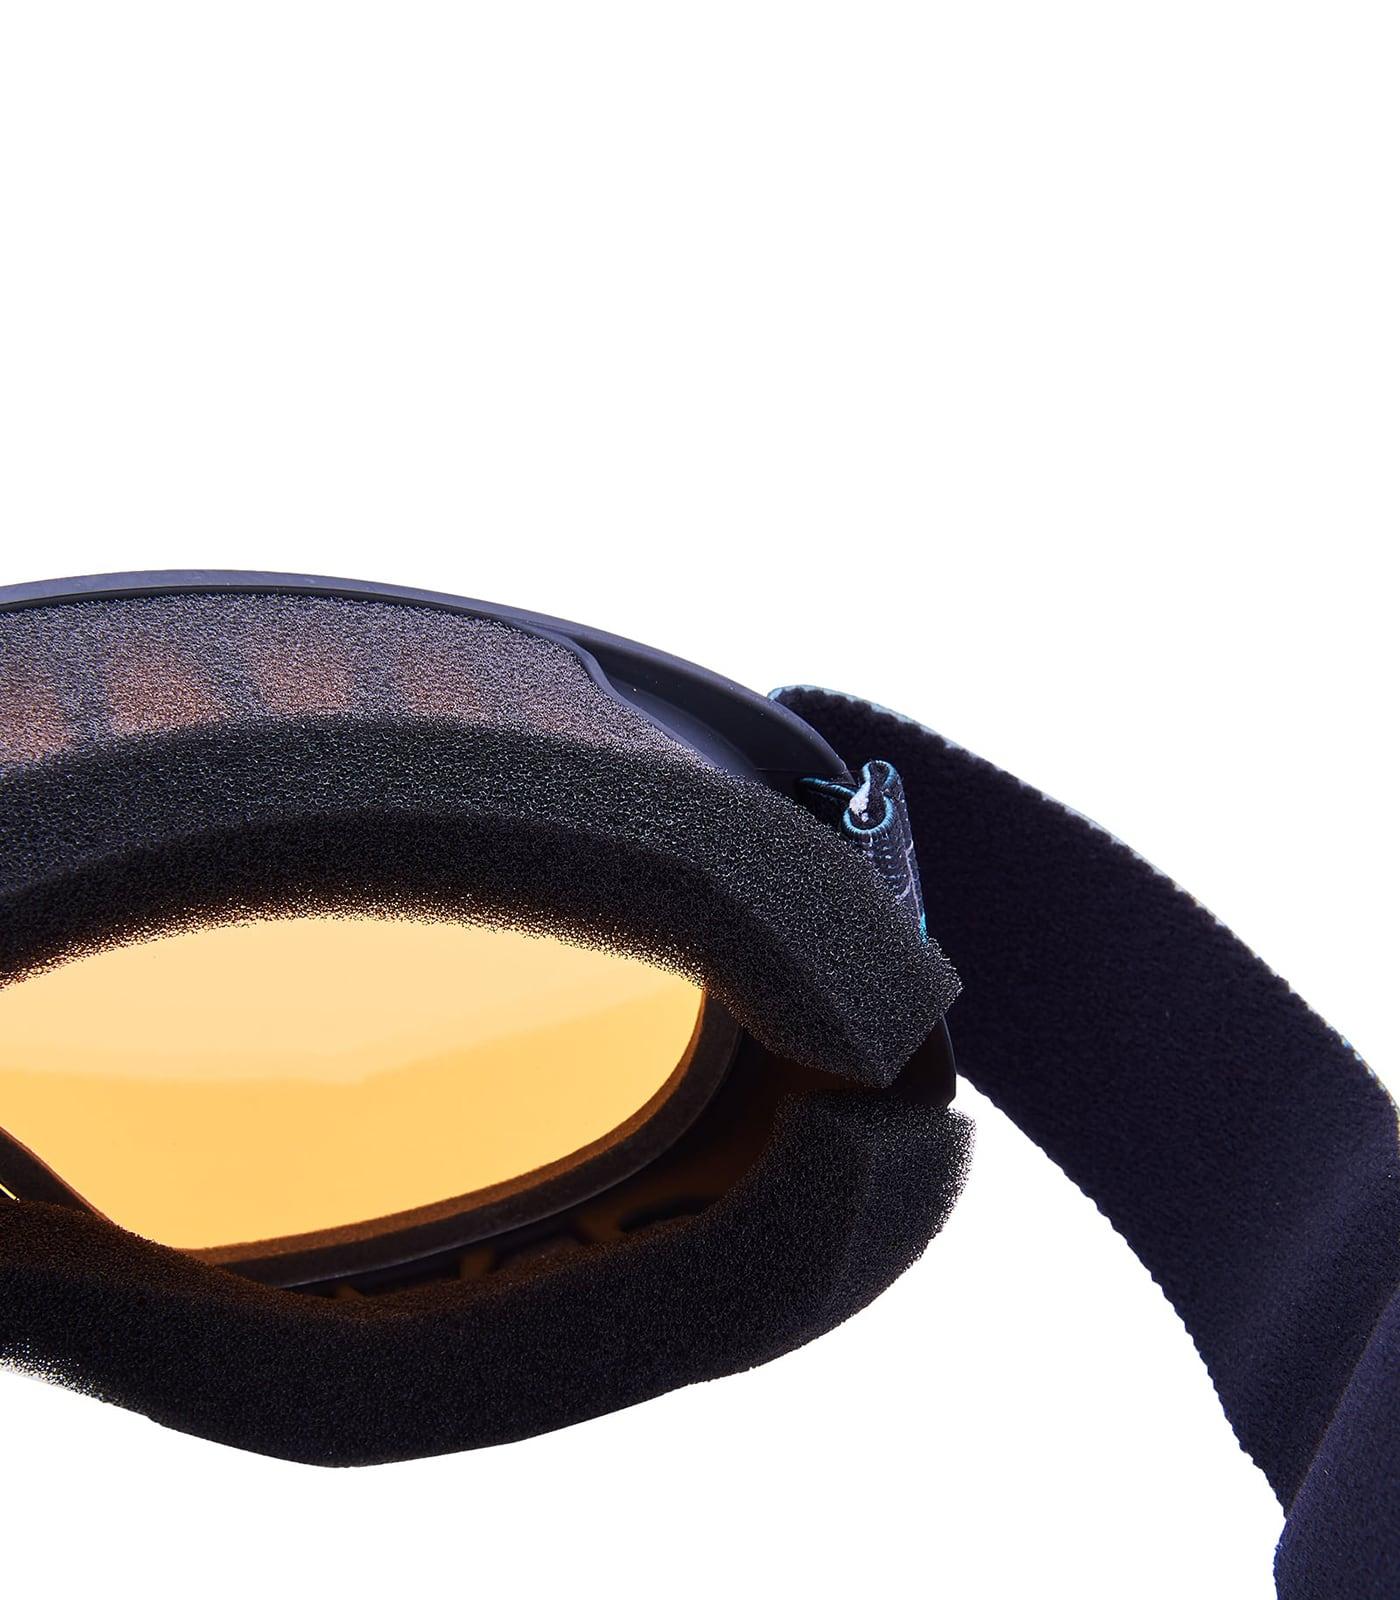 BLIZ Ski Gog. 929 DAO, black, amber1